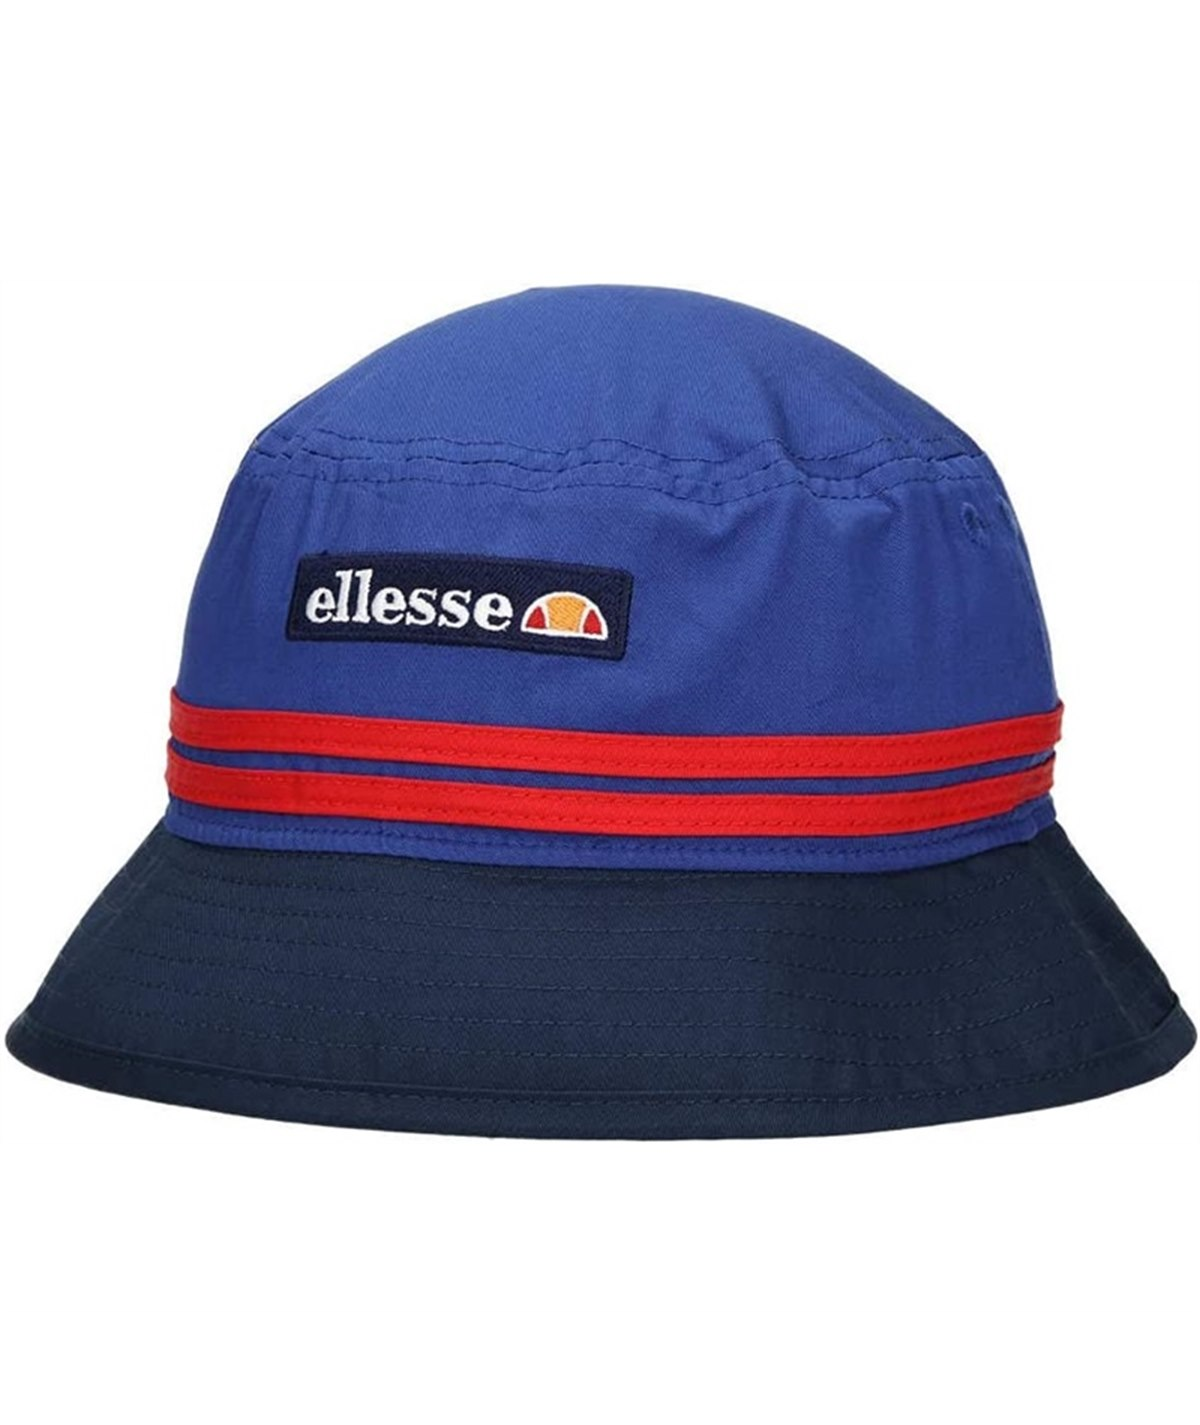 cappello pescatore bucket casuals ellesse bicolor